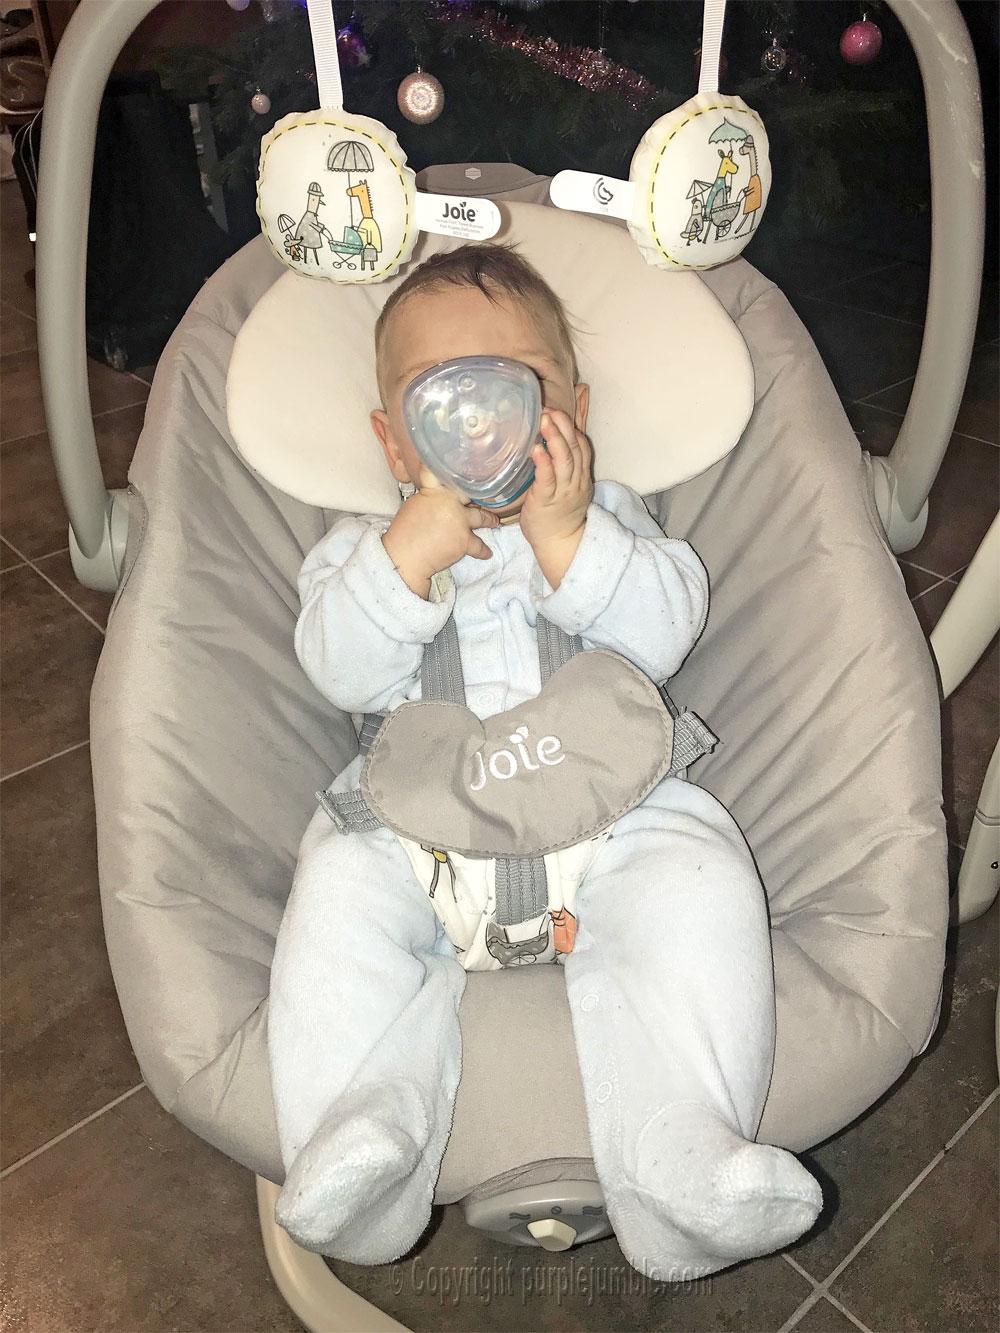 balancelle bébé serina 2 en 1 joie côté biberon